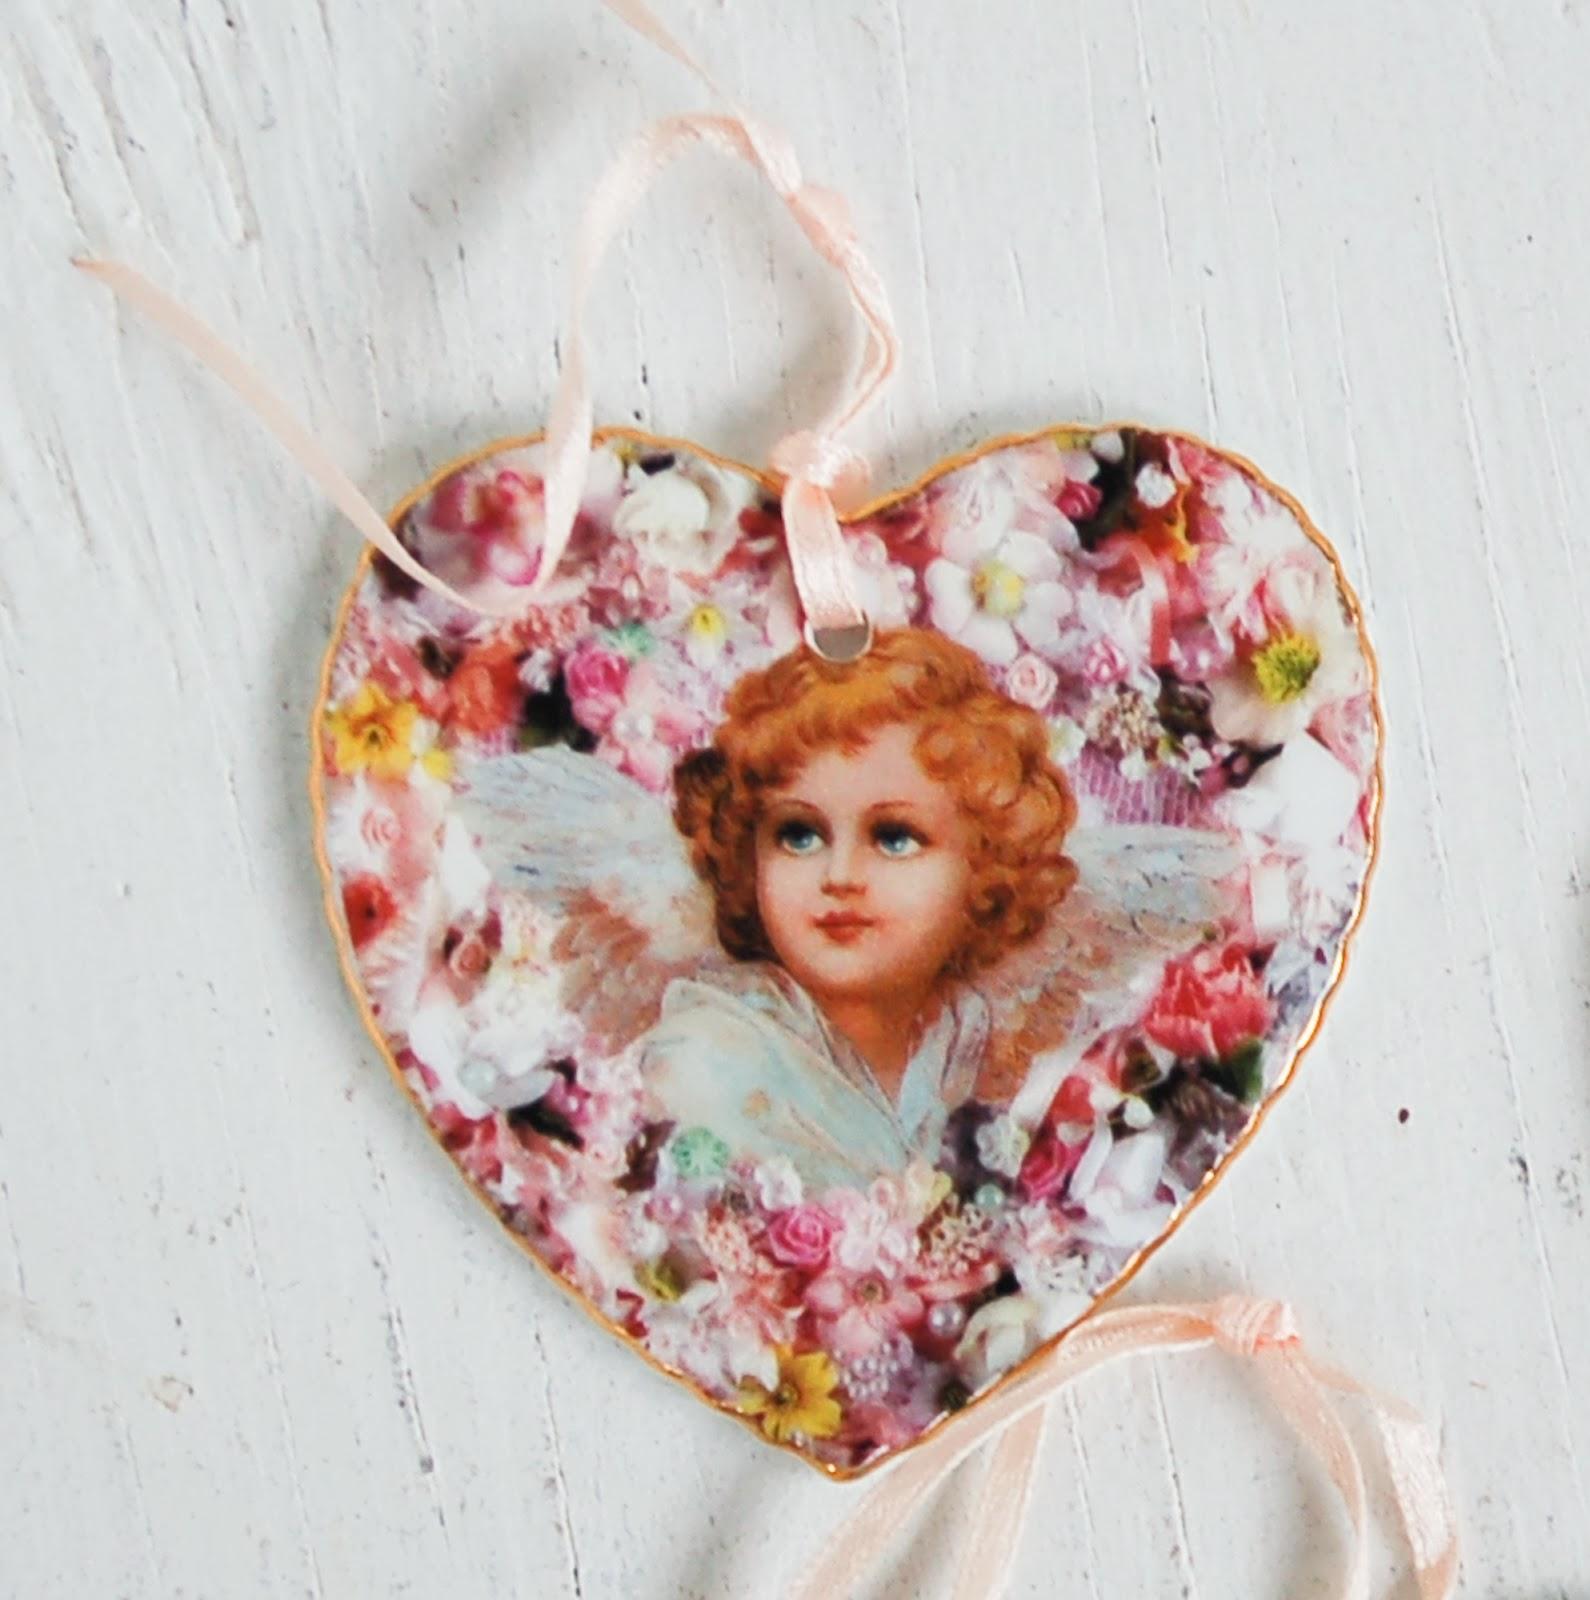 https://www.etsy.com/listing/64628395/3-vintage-porcelain-hearts-romantic?ref=shop_home_active_1&ga_search_query=heart%2Bornaments